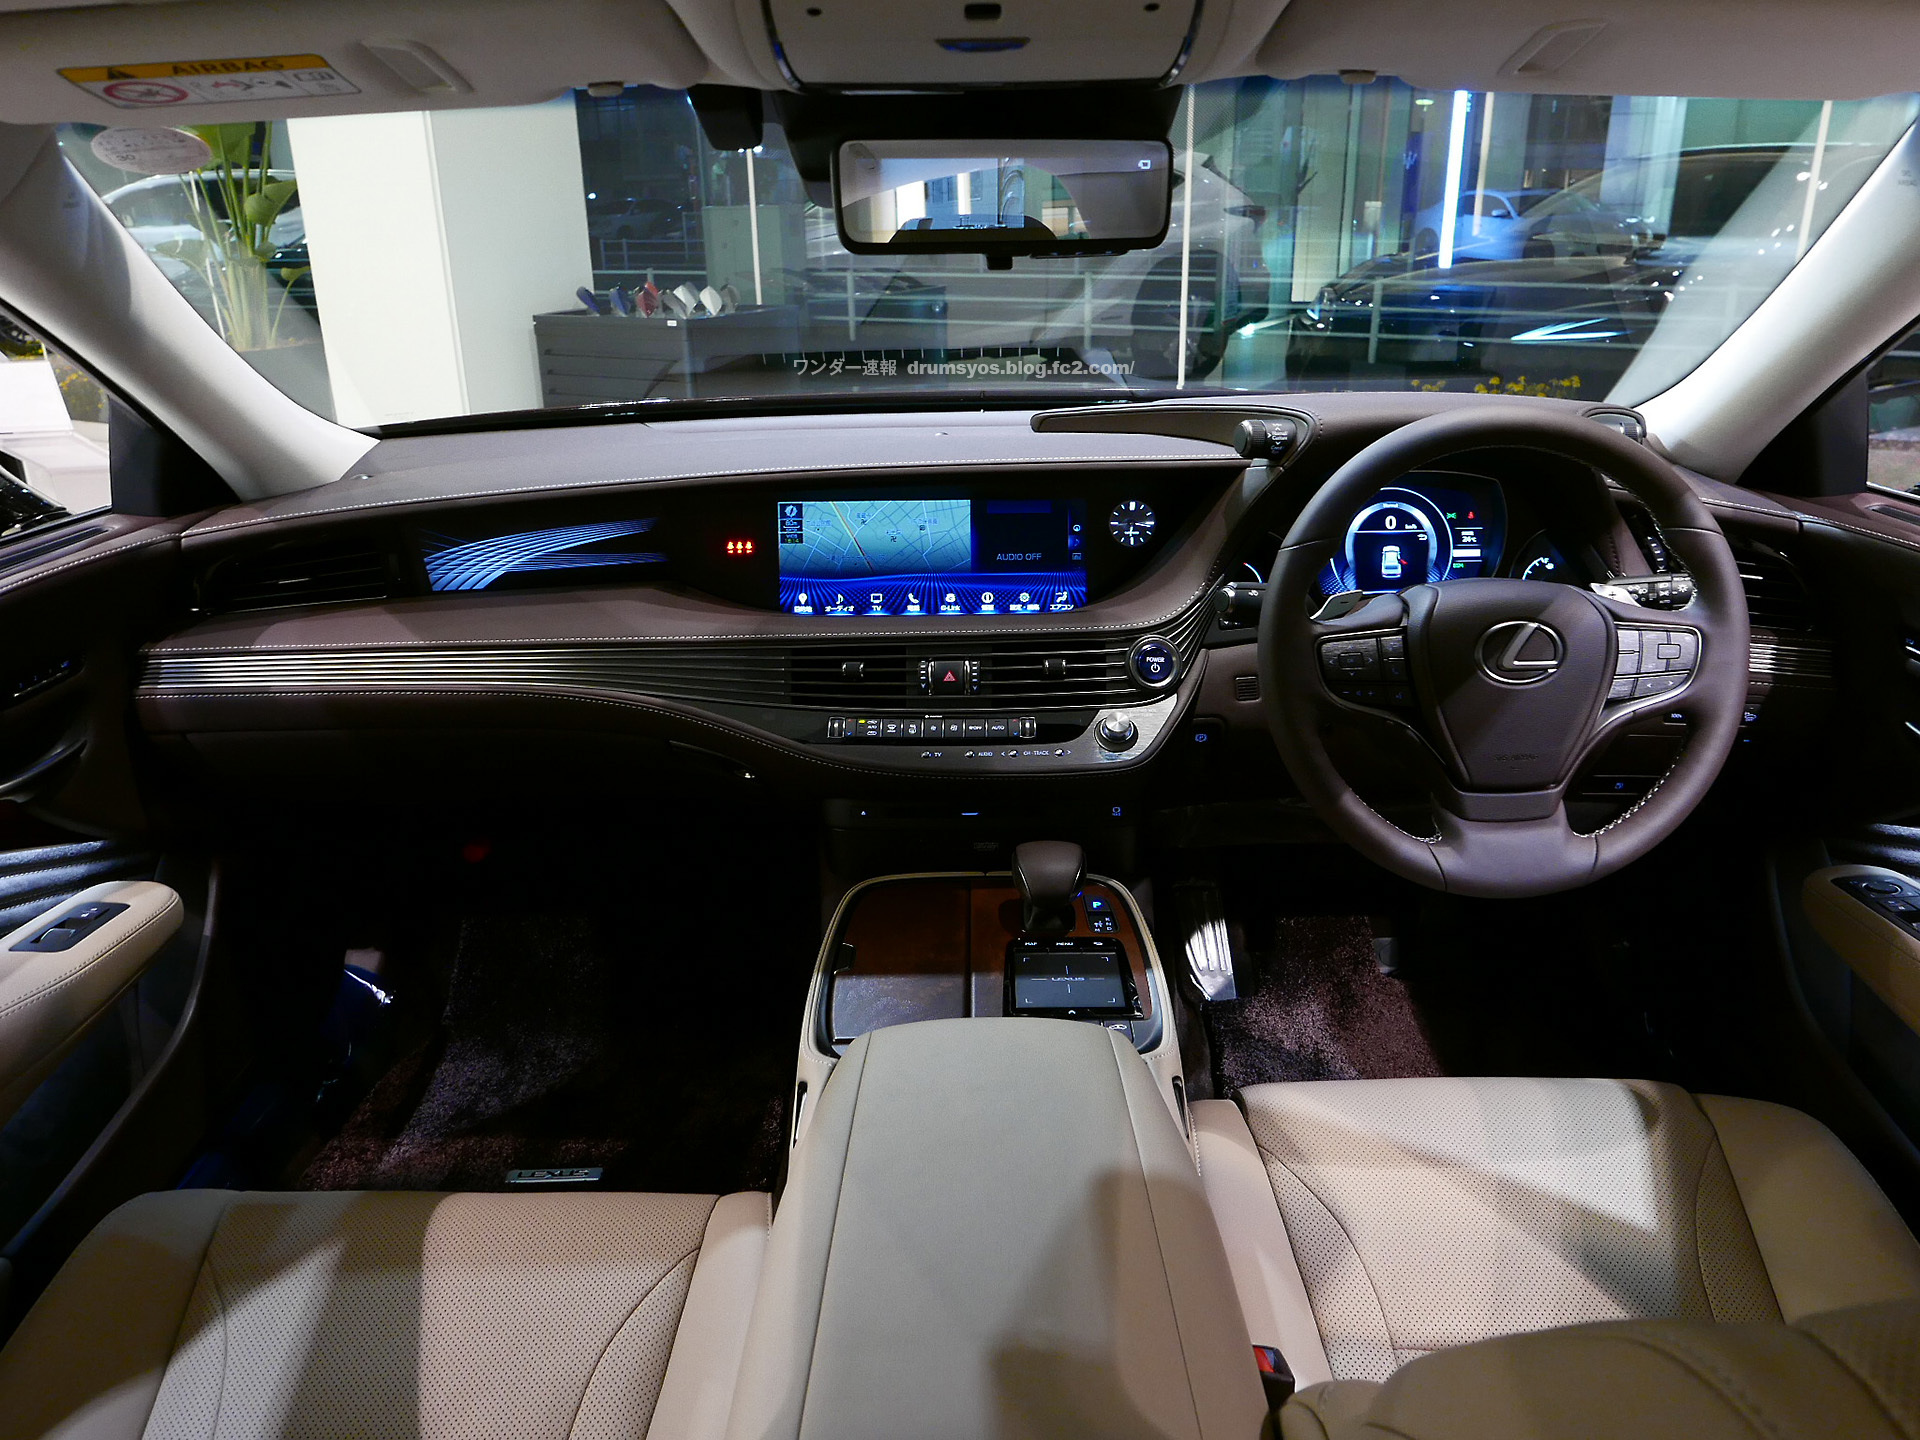 LexusLS500hI02_20171123060422dc2.jpg